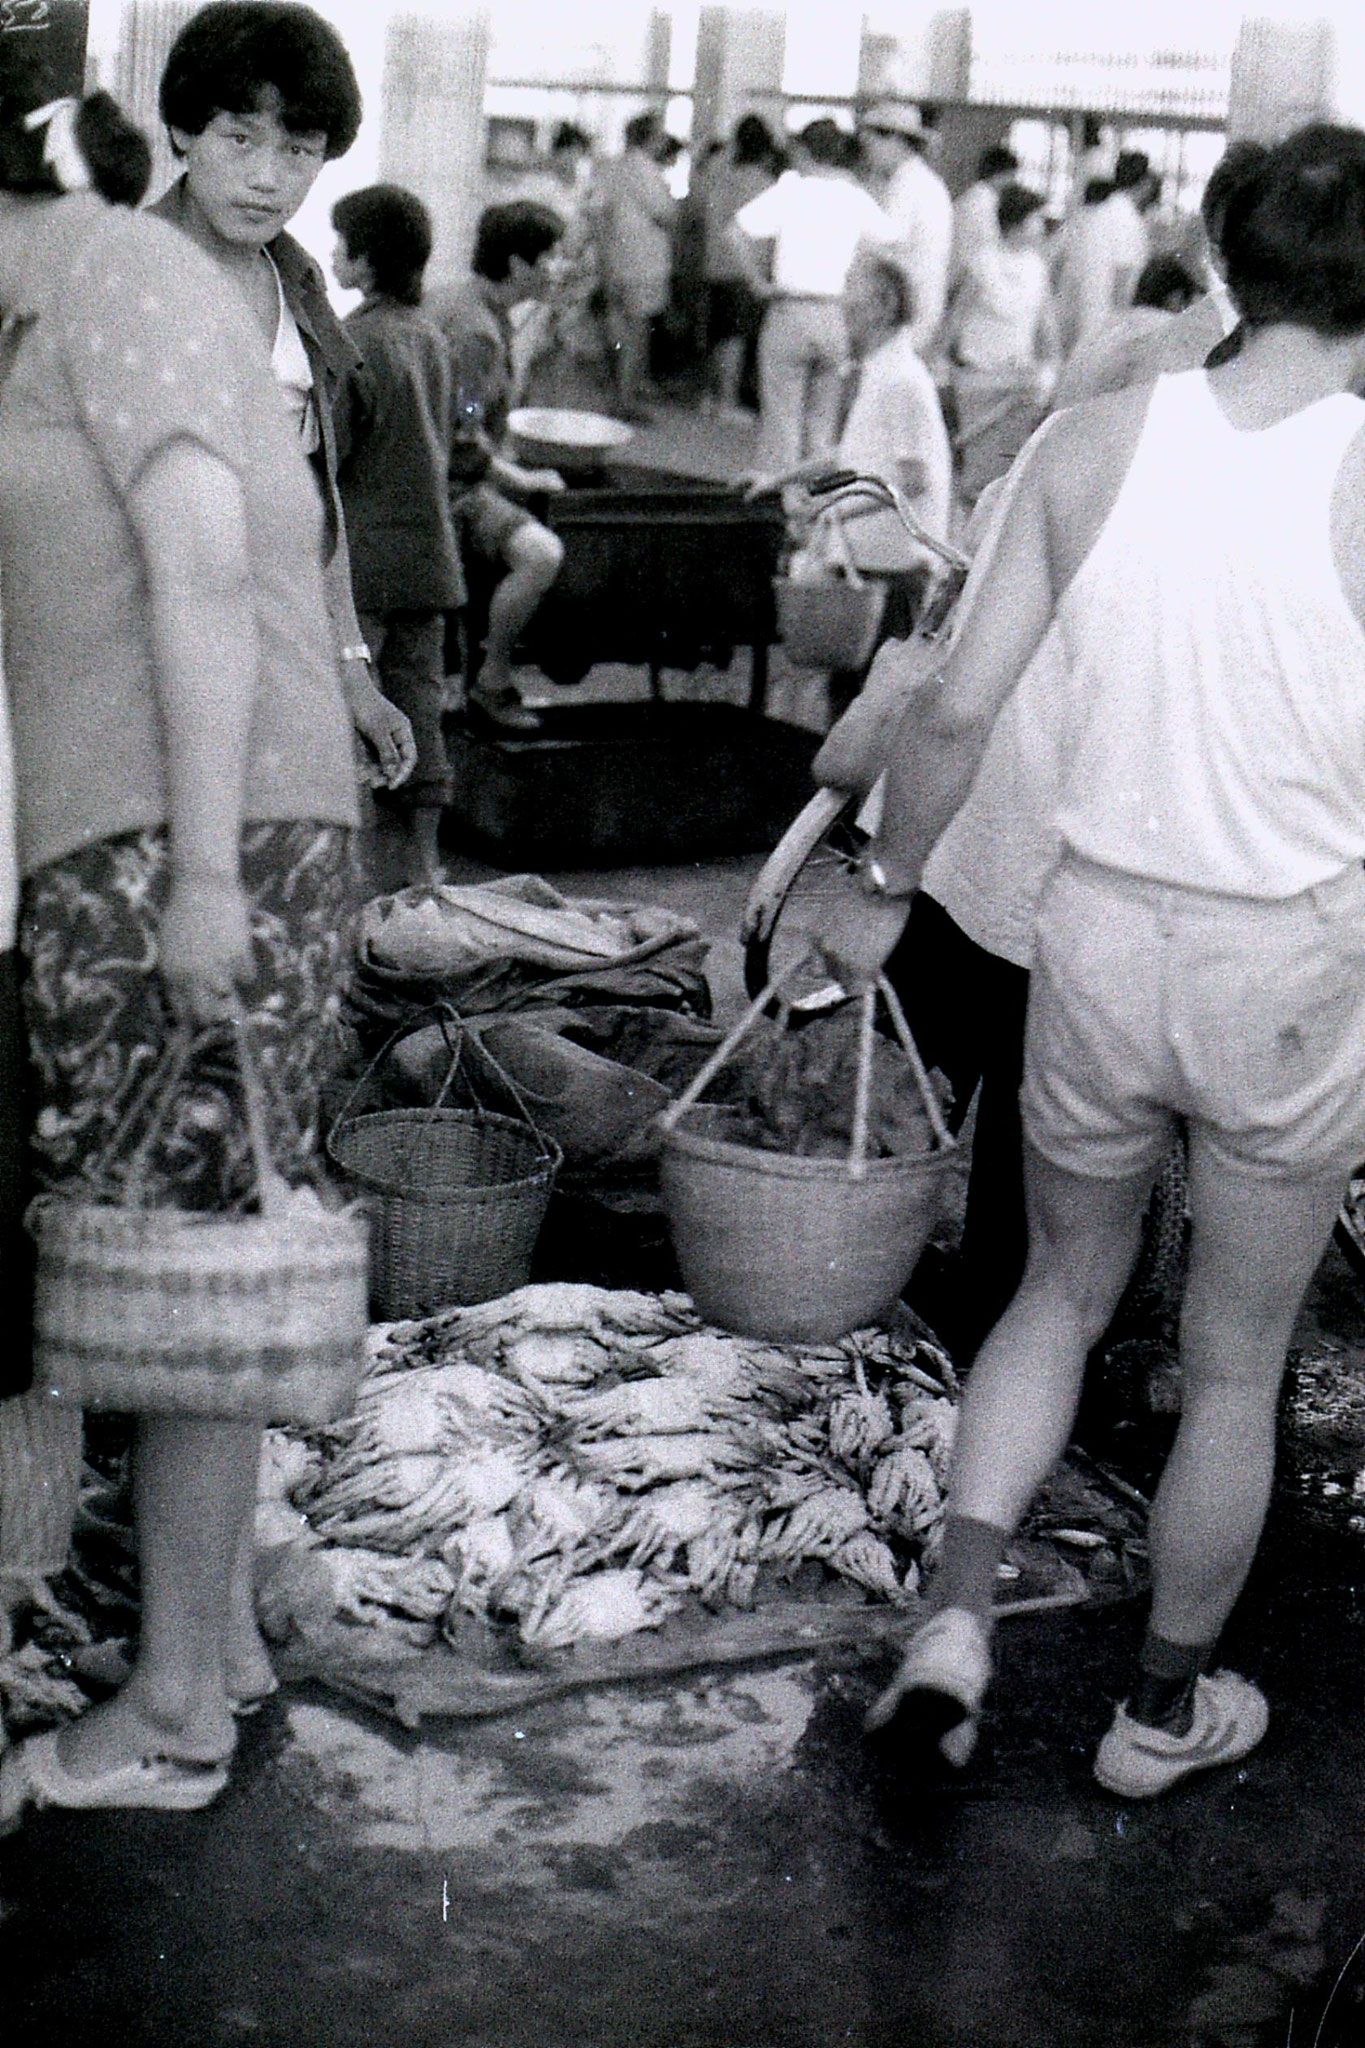 19/7/1989: 24: Zheda Free market